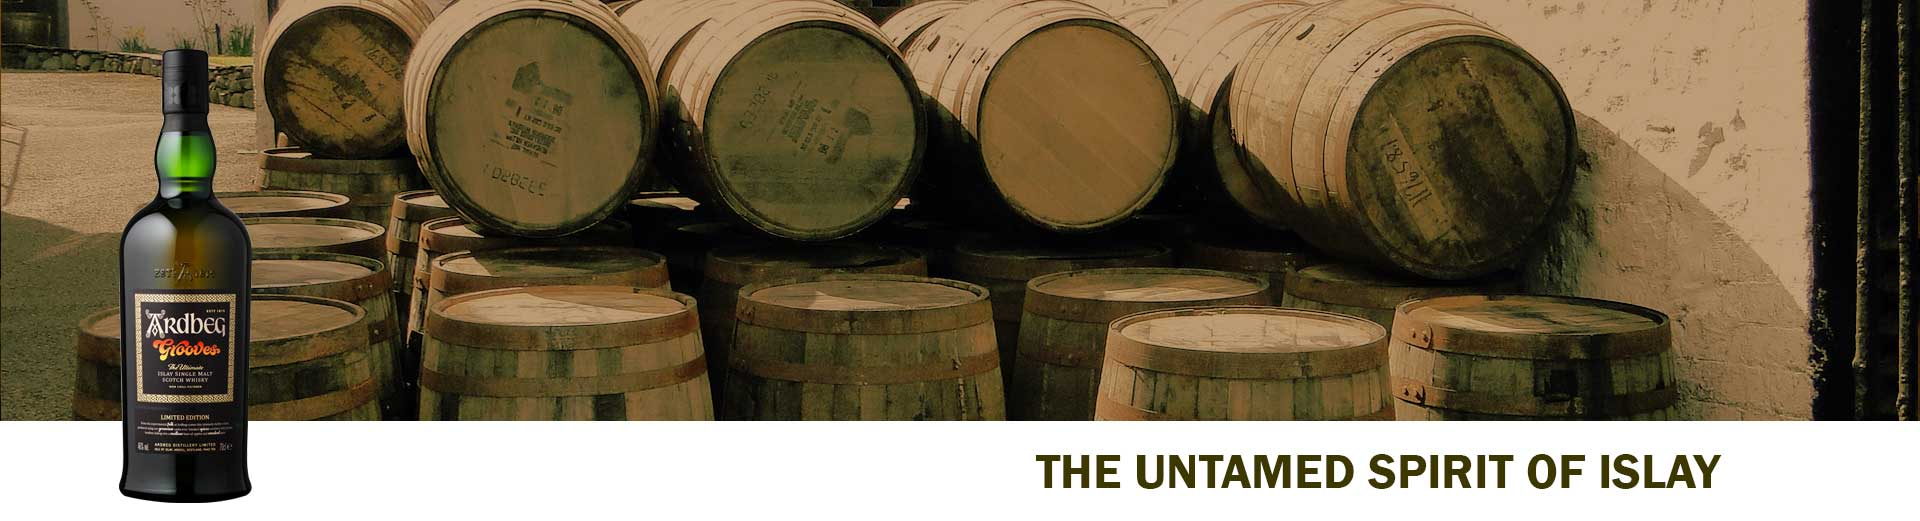 Ardbeg Distillery - The untamed spirit of Islay